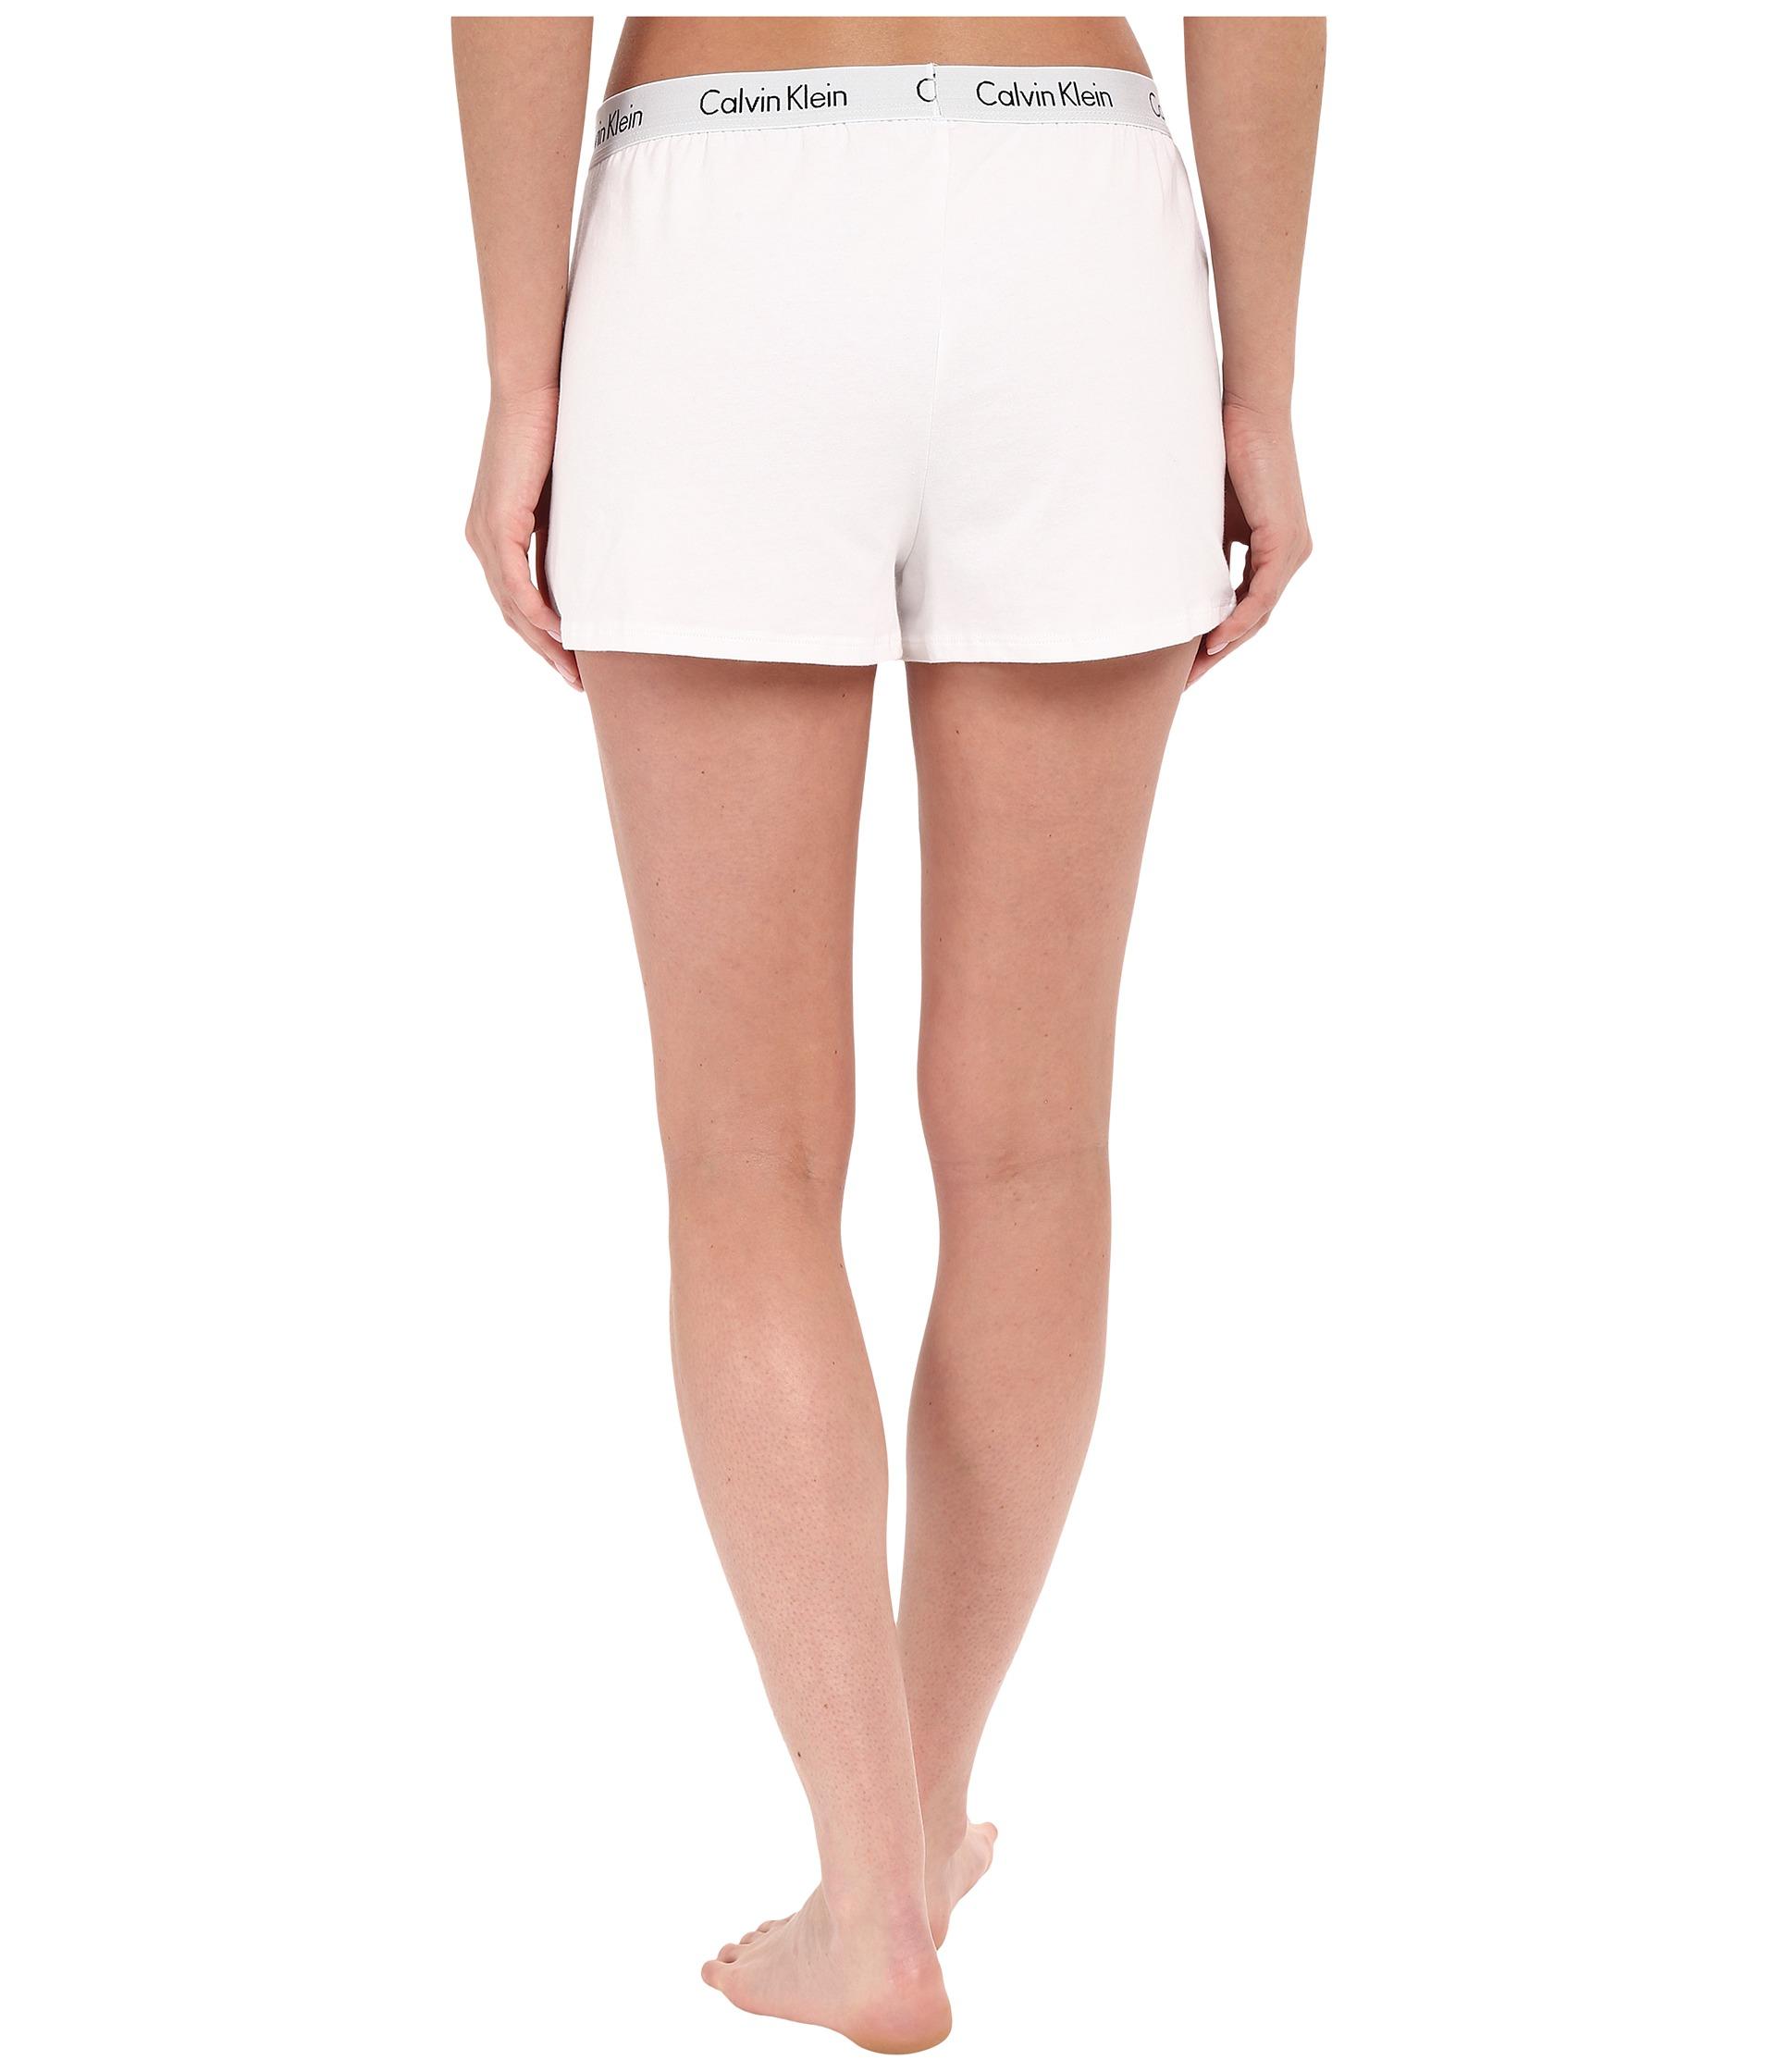 calvin klein underwear shift knit shorts free shipping. Black Bedroom Furniture Sets. Home Design Ideas